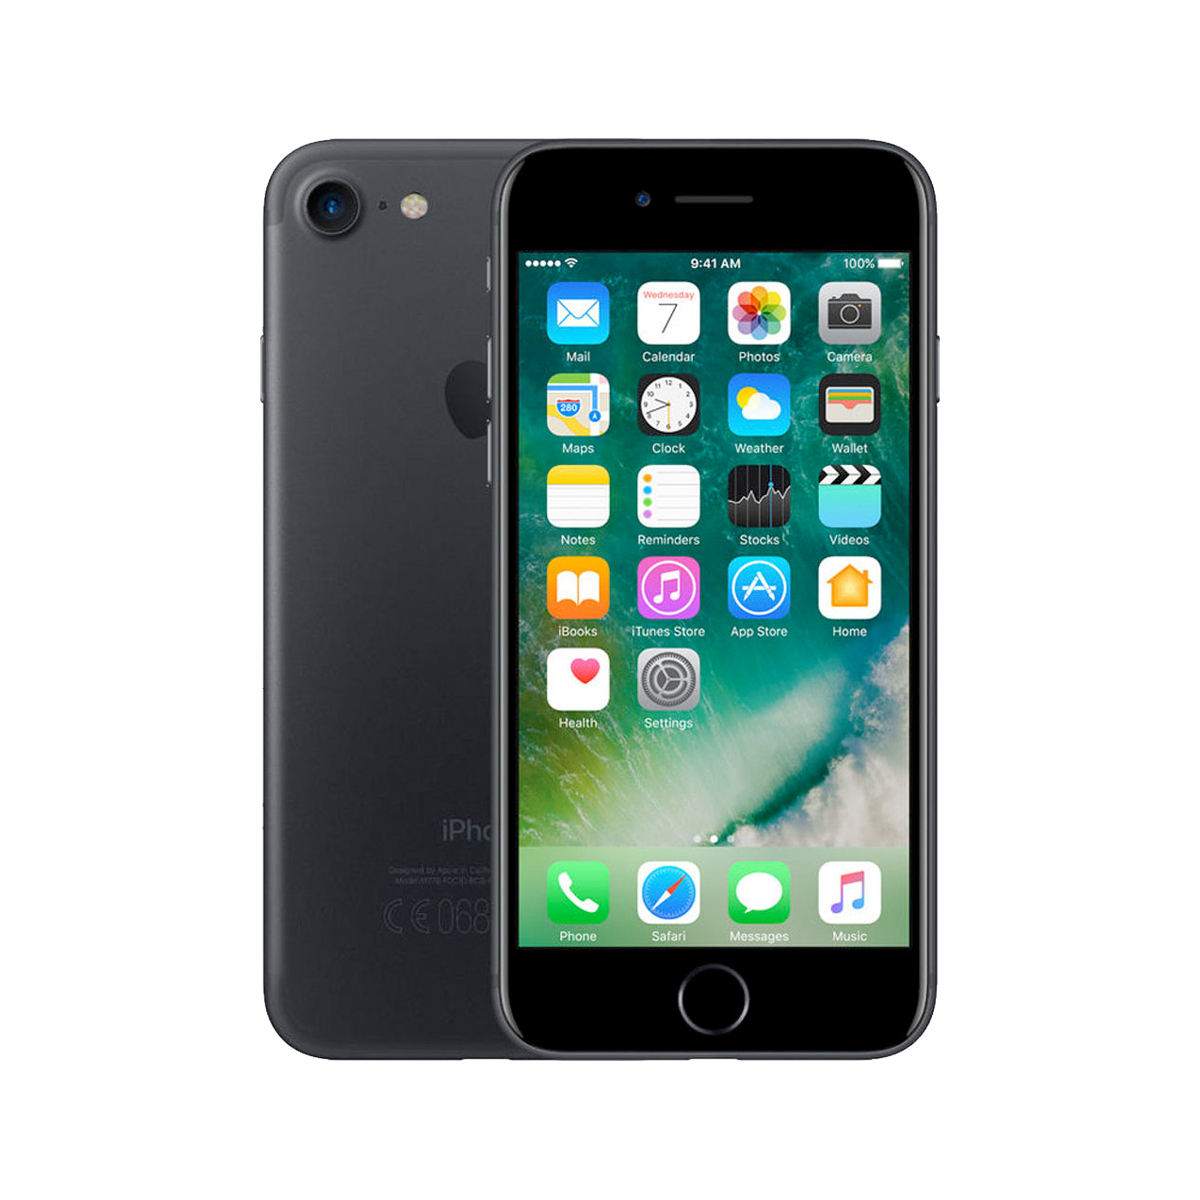 Renewd Apple iPhone 7 Black 128GB